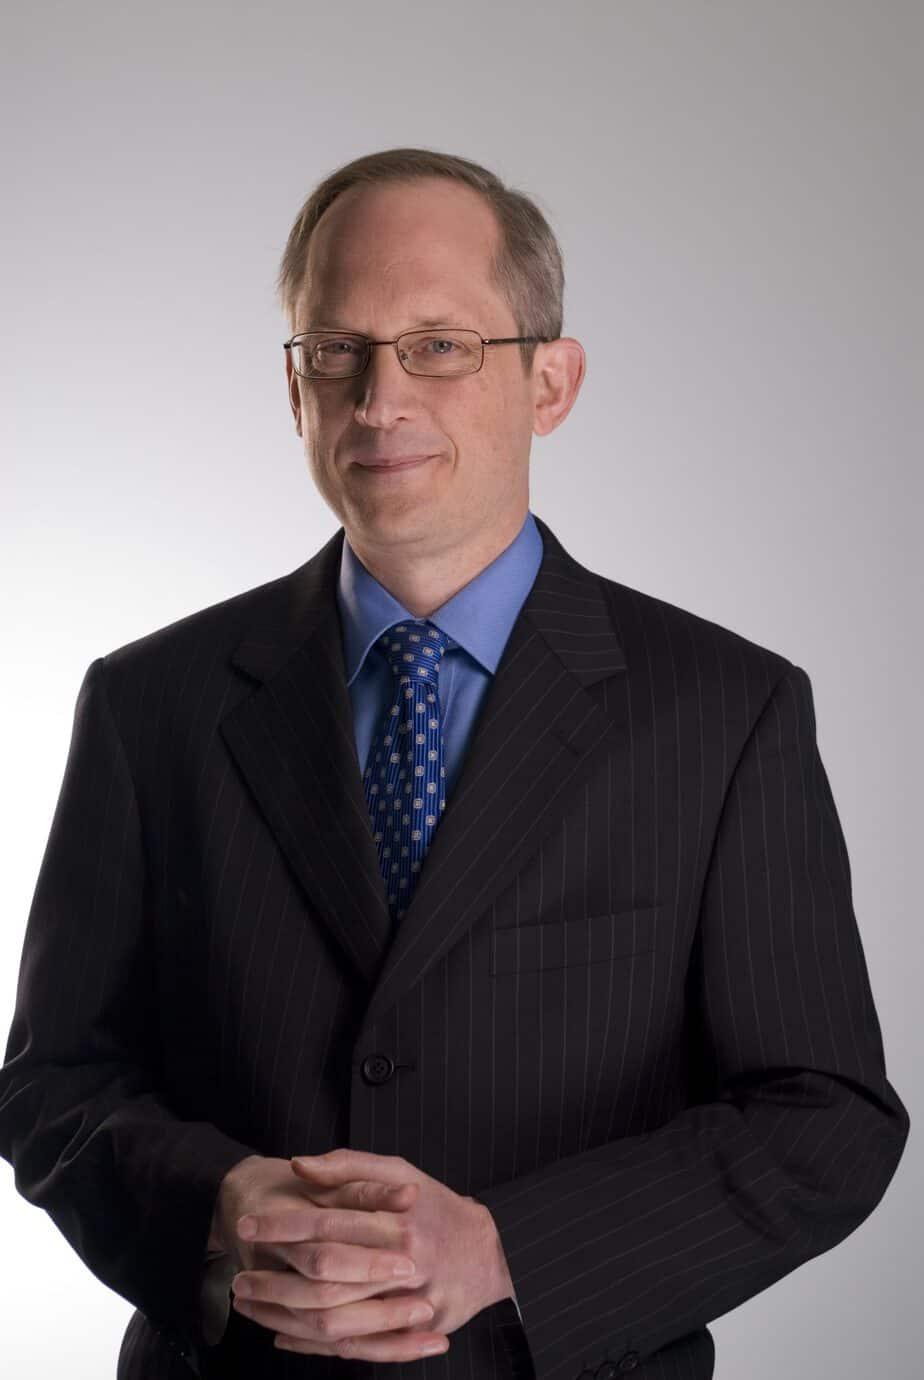 Matthew Shepherd